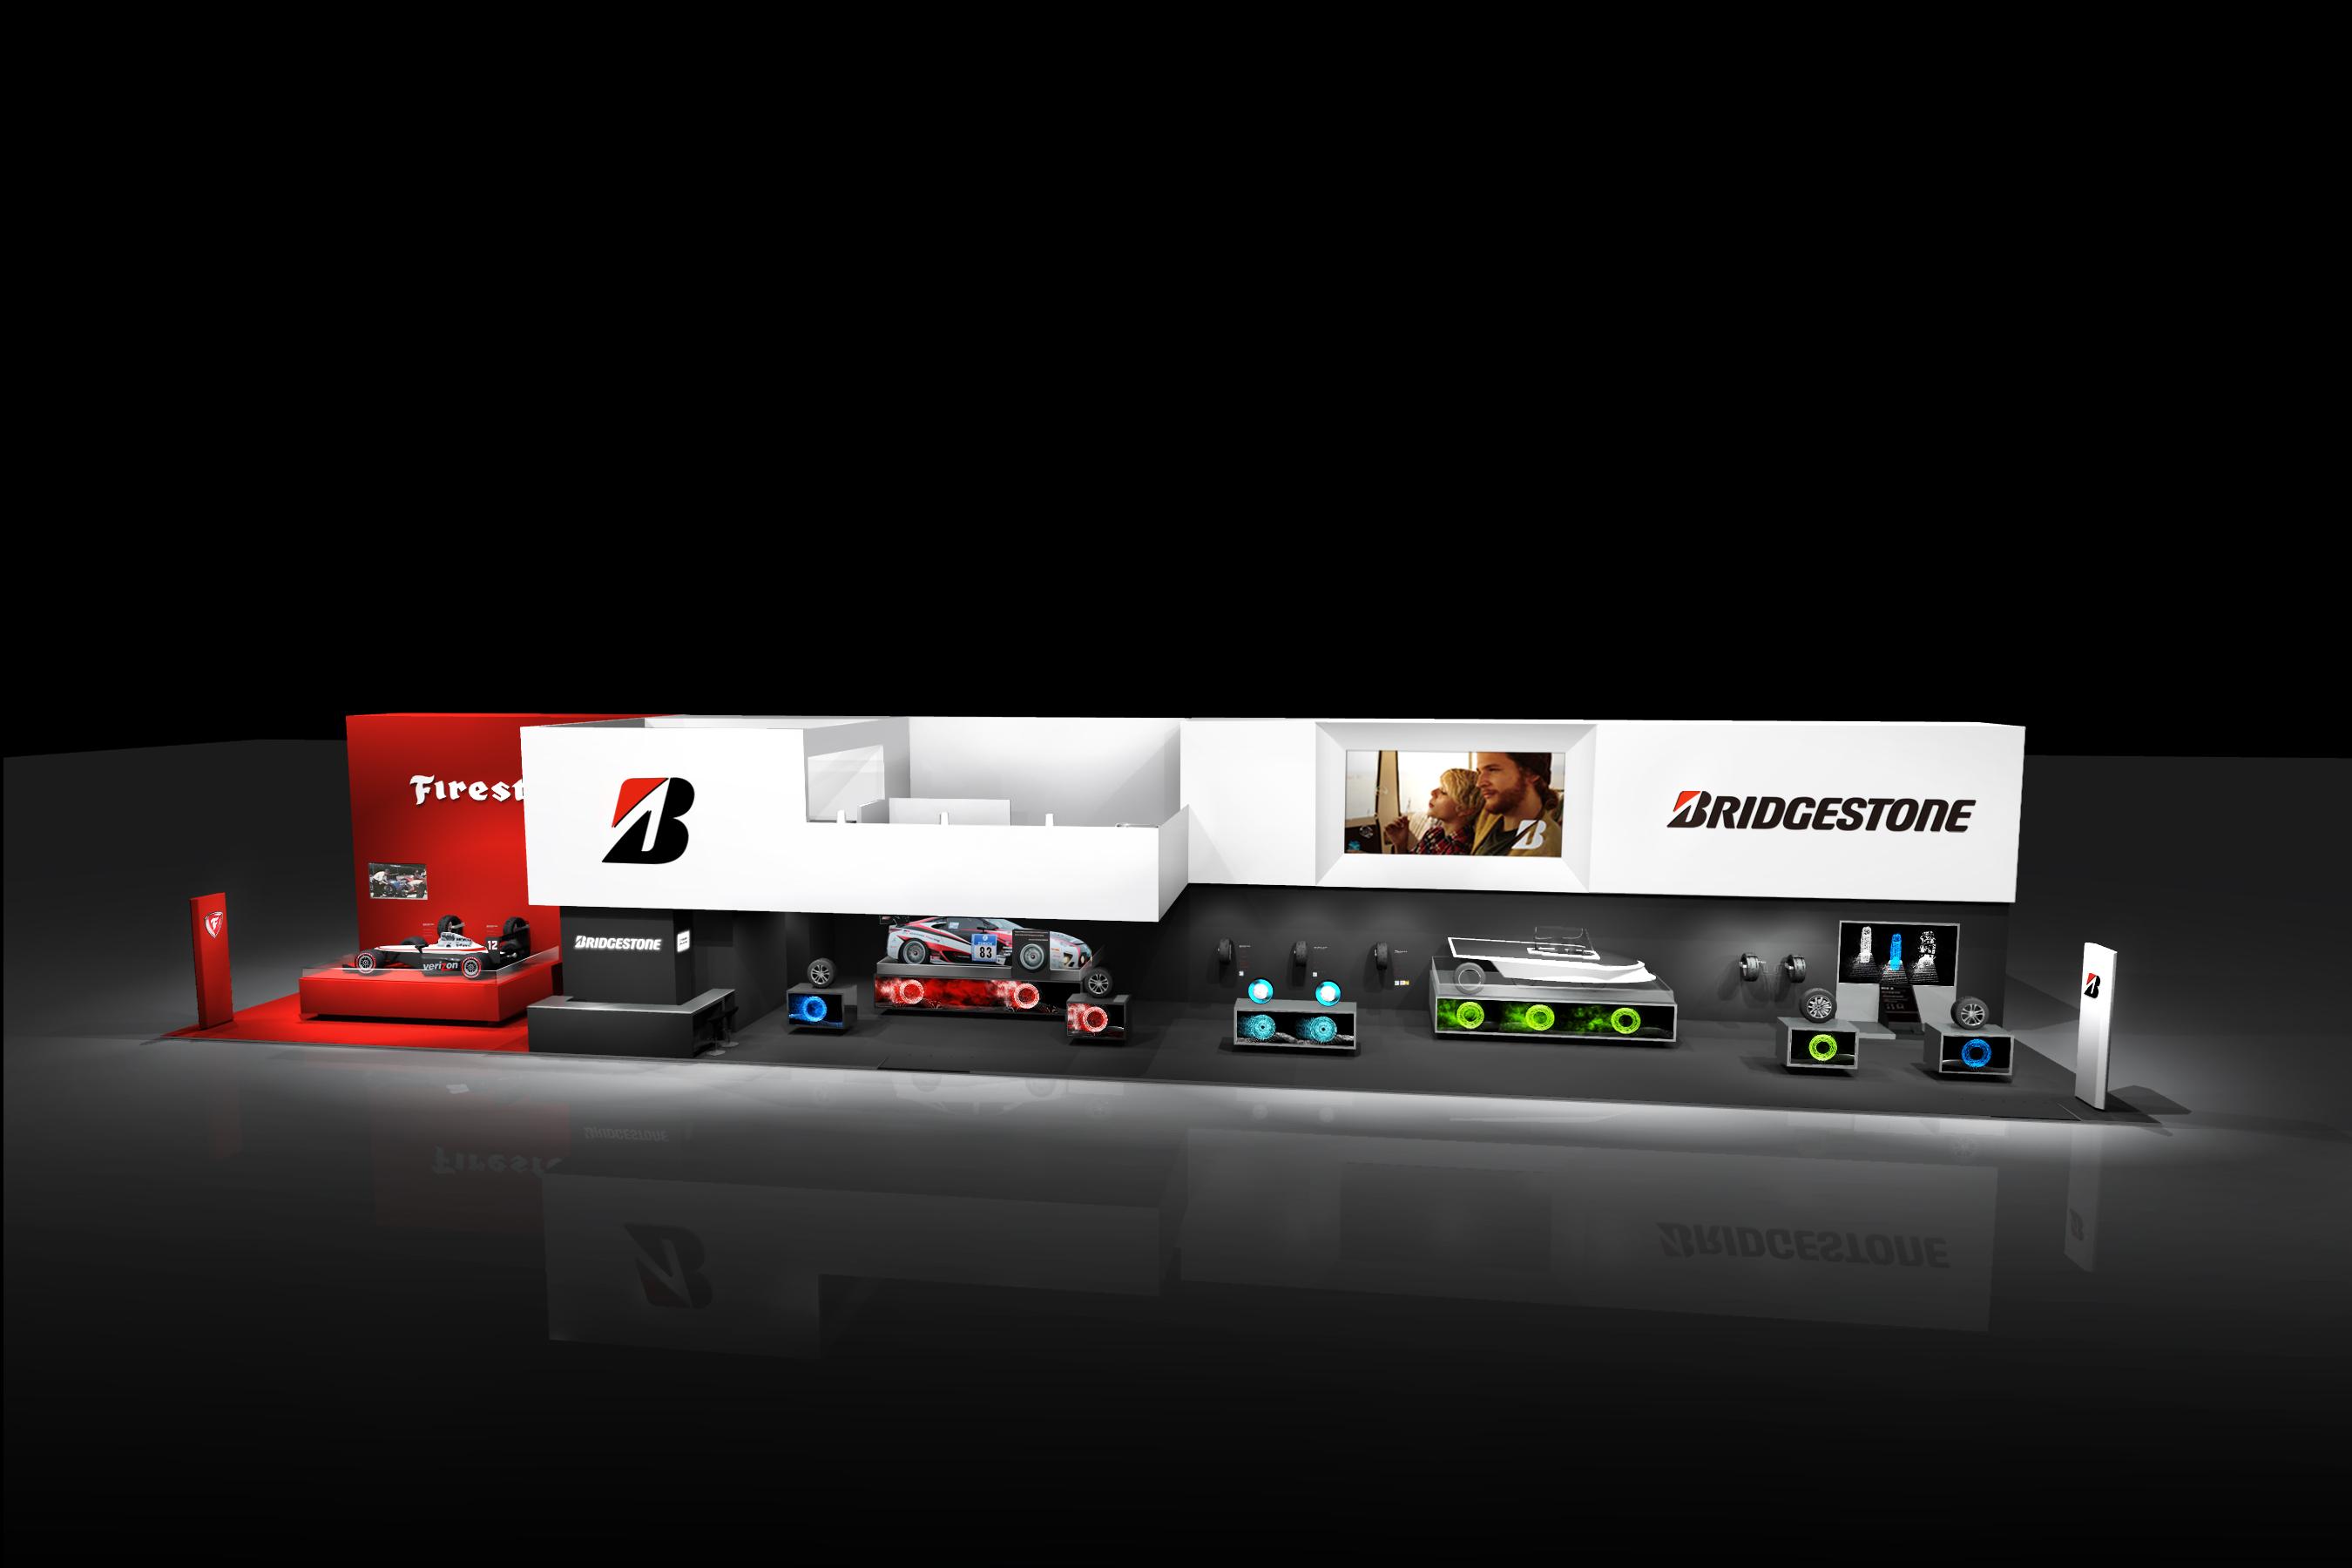 Bridgestone lanseaza la IAA 2018 produse si solutii de ultima generatie – eficienta, confort, durabilitate